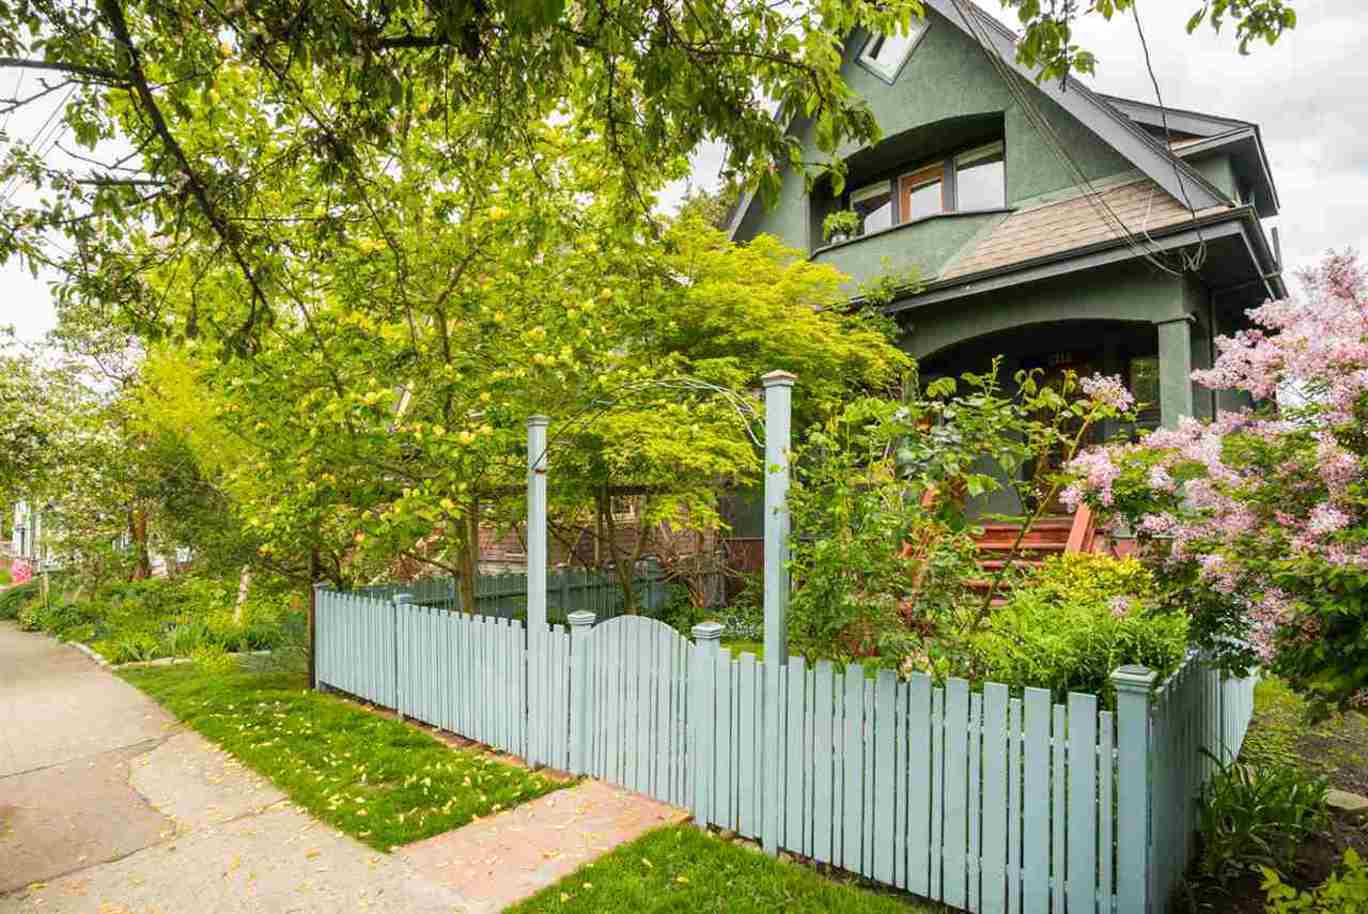 1216-lakewood-drive-grandview-ve-vancouver-east-01 at 1216 Lakewood Drive, Grandview VE, Vancouver East